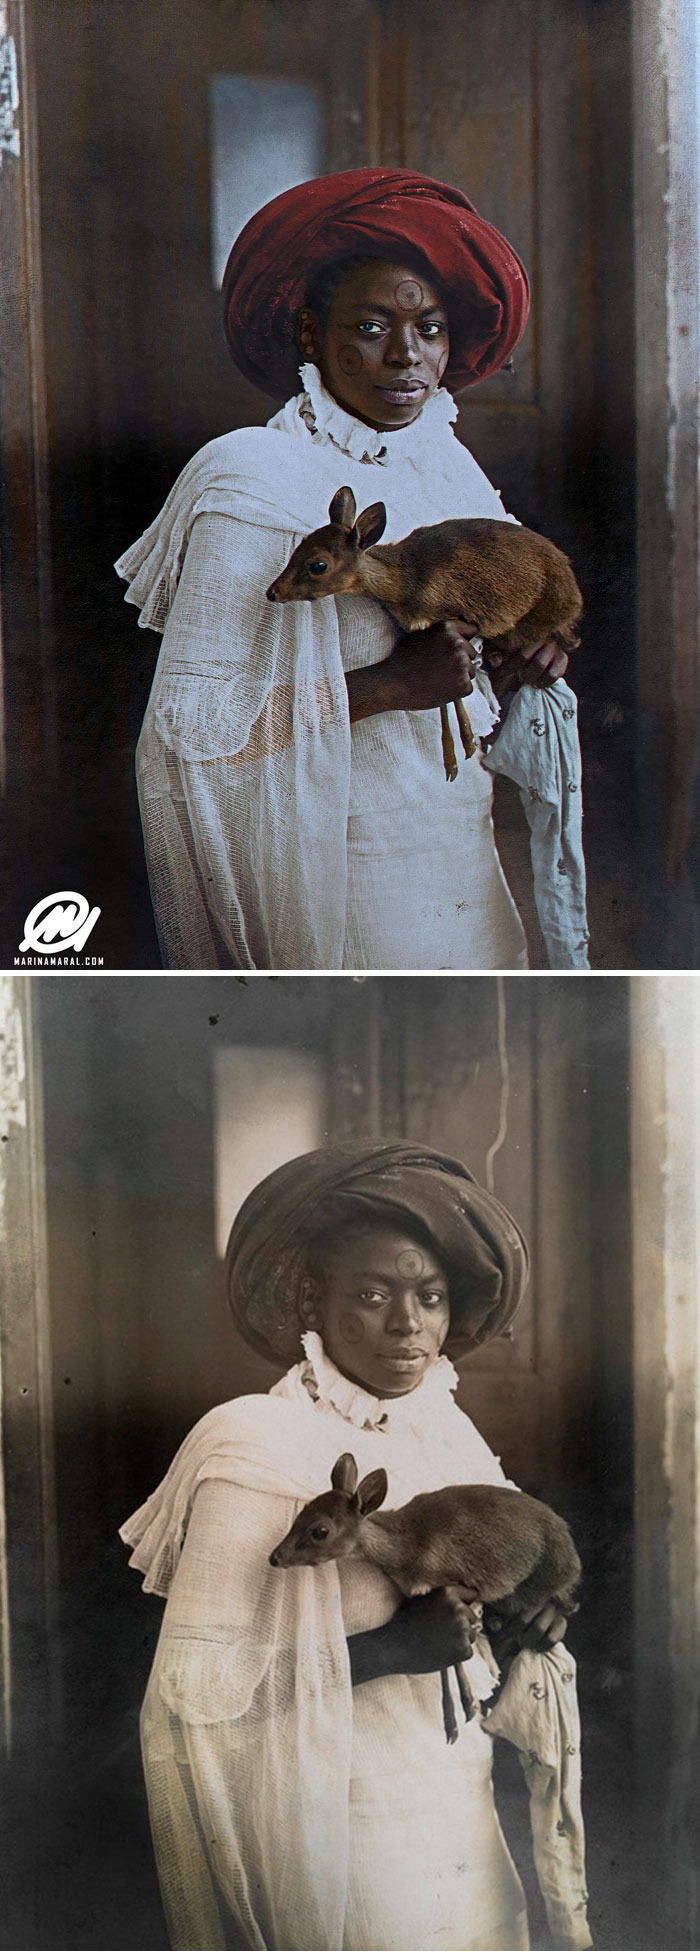 Mujer de Kenia sosteniendo un dik-dik, Mombasa, 1909